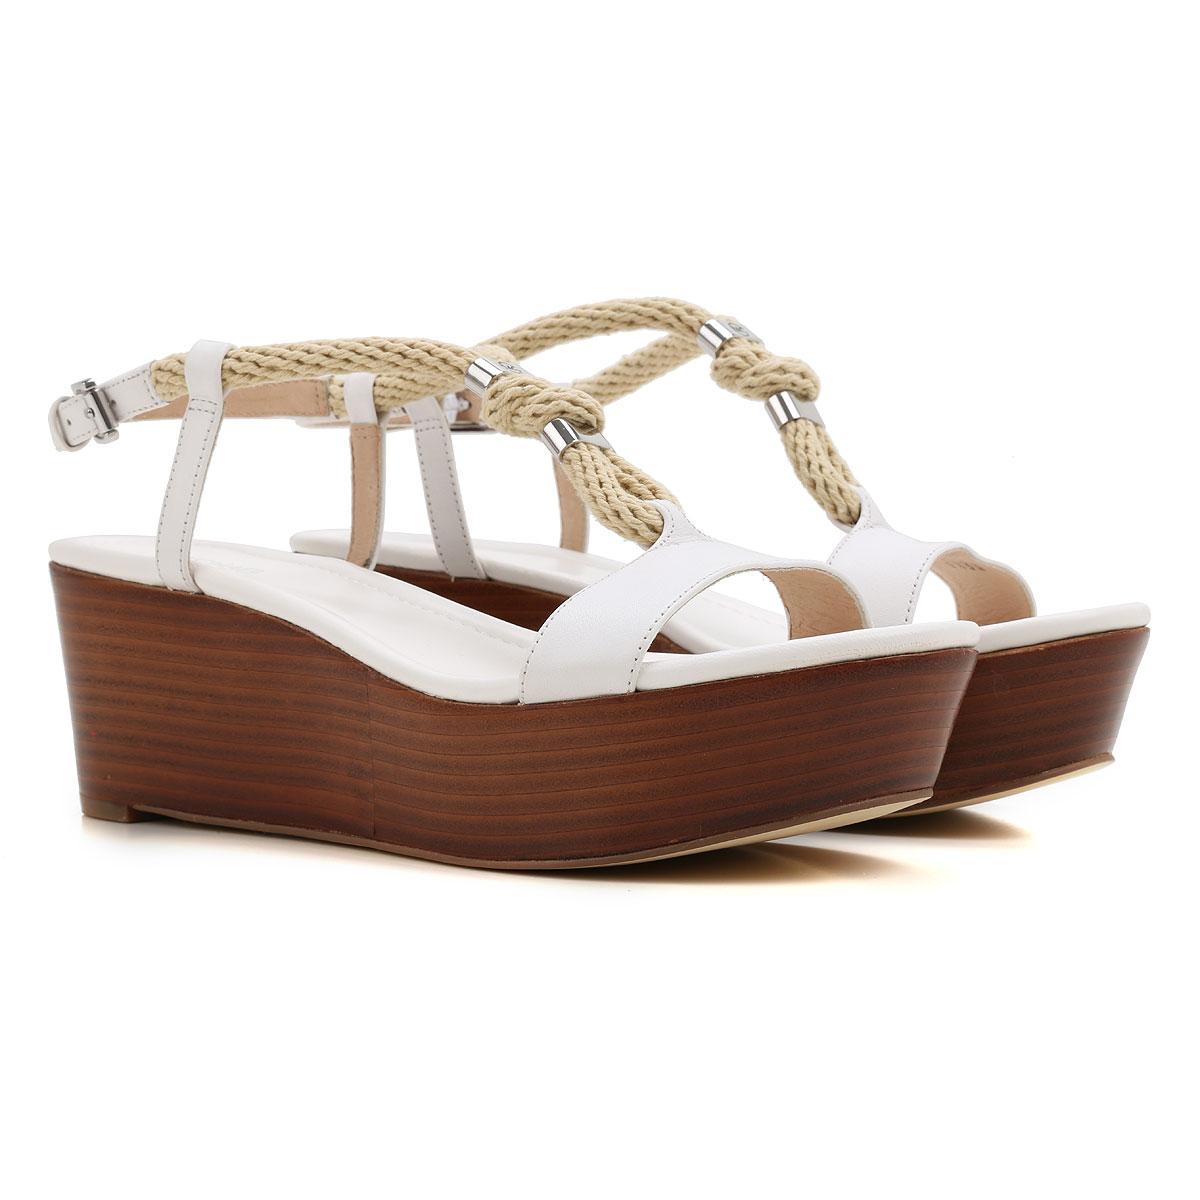 Unique Michael Kors Shimmer Sling Satin Dress Shoes Size 85  For